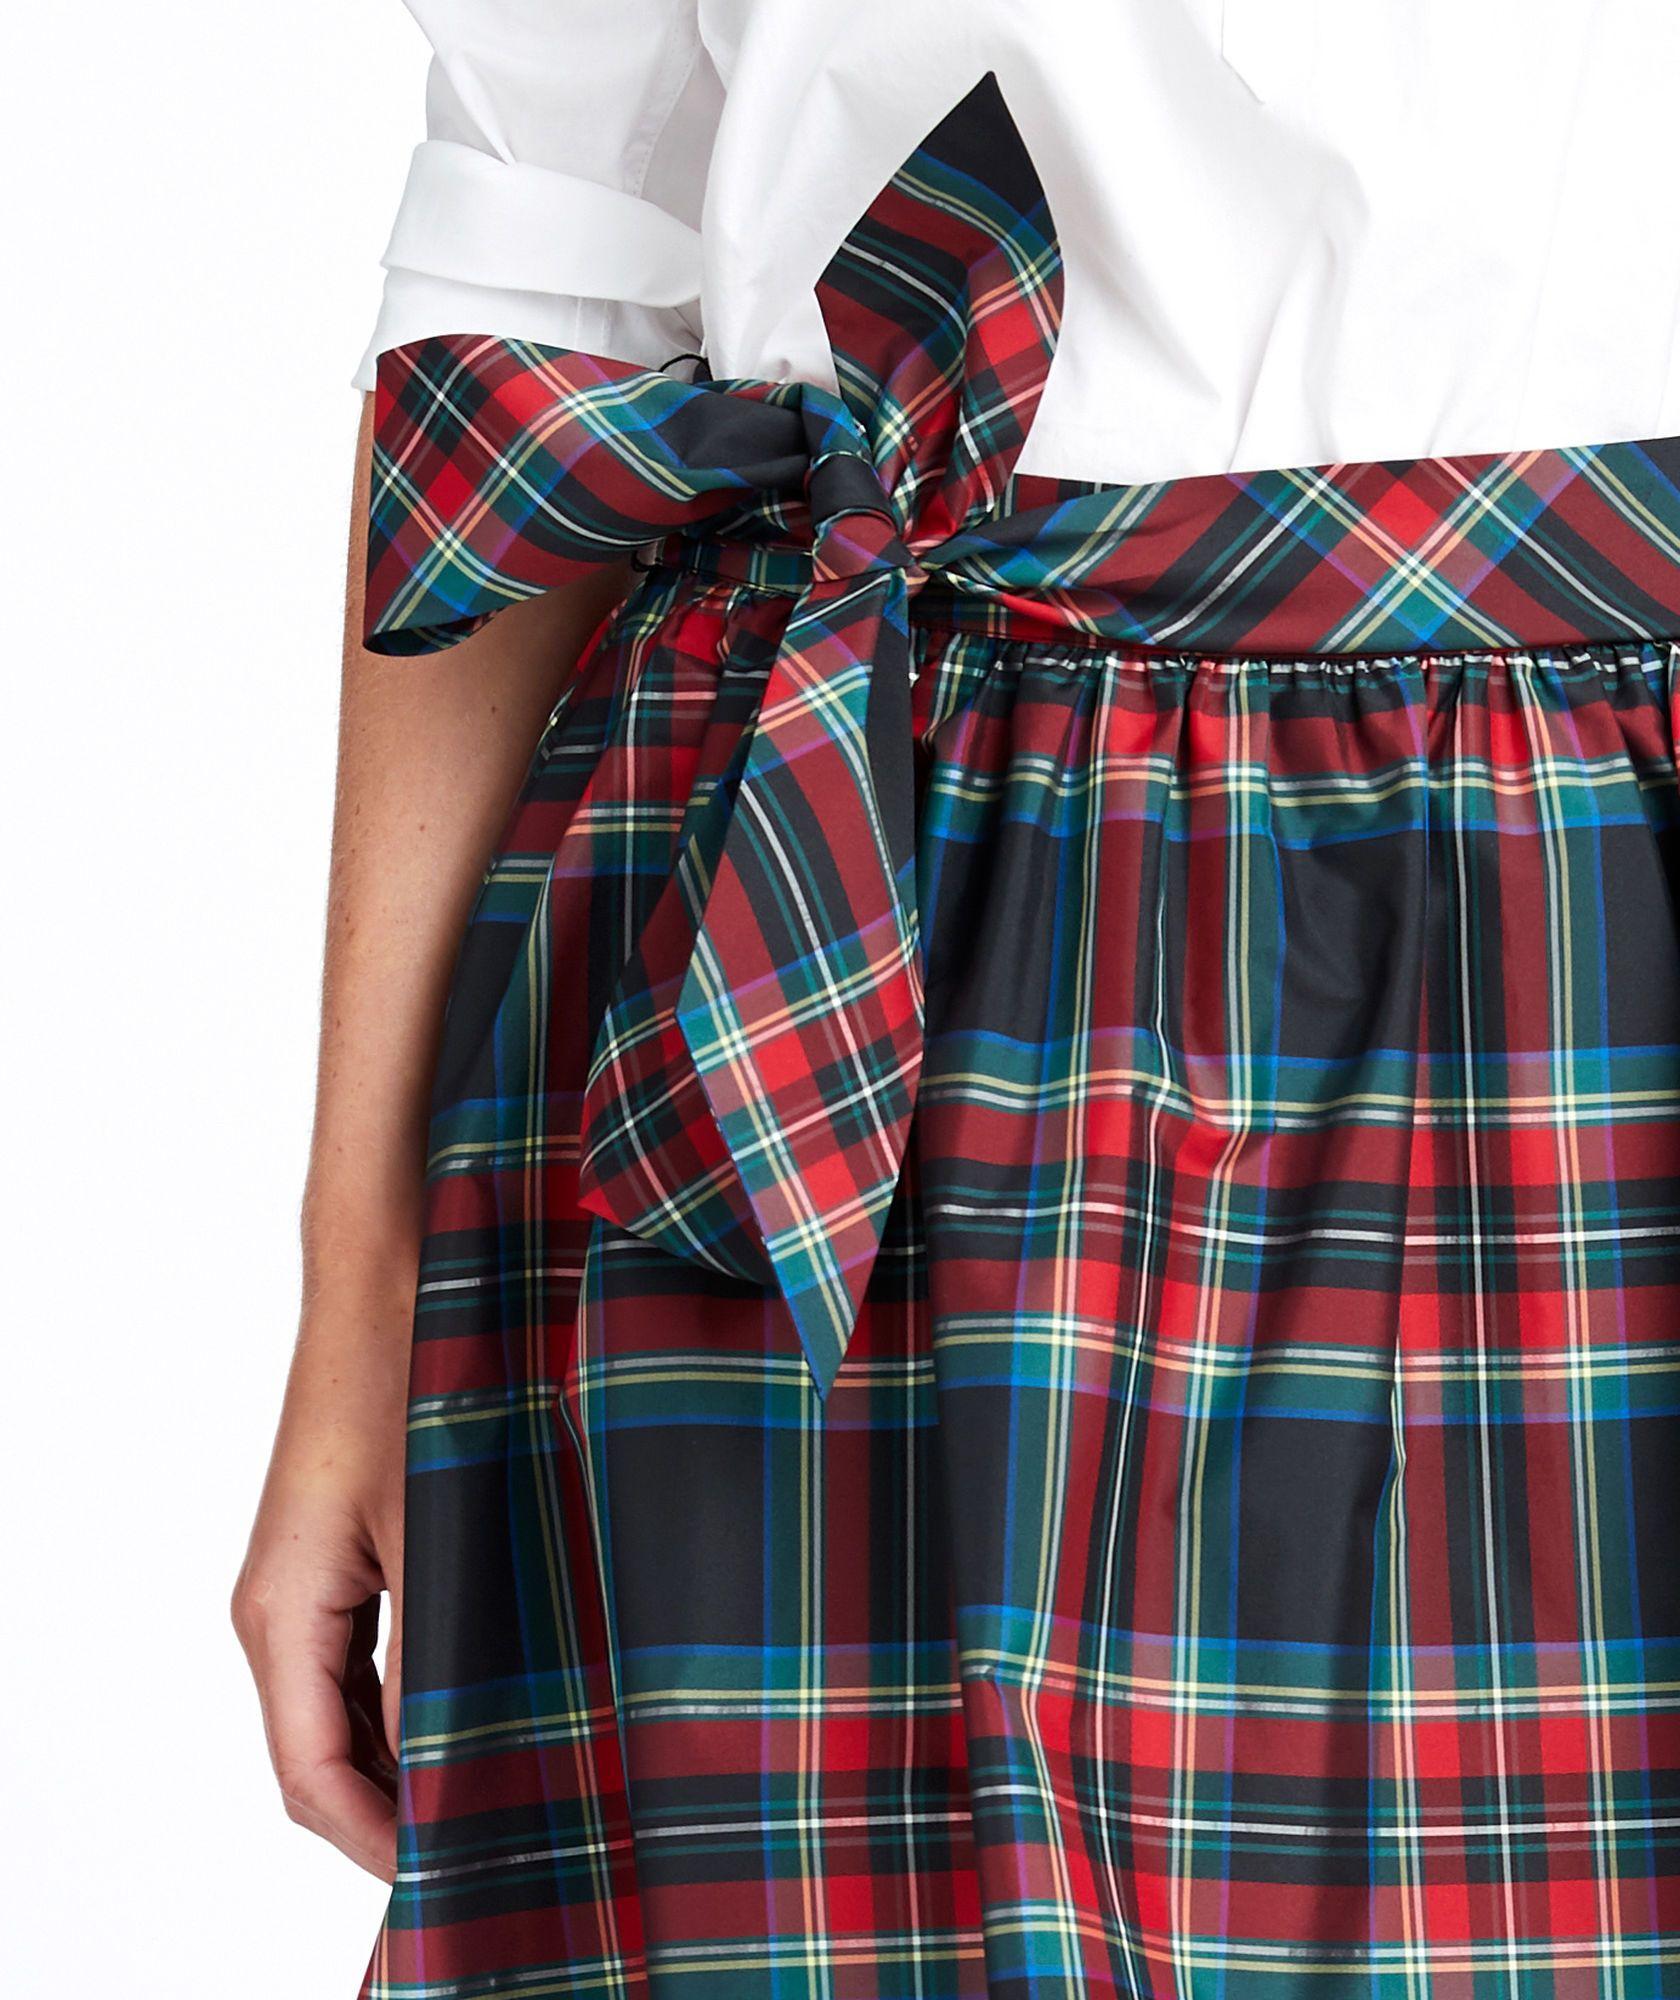 18e9db4d9 Jolly Plaid Taffeta Party Skirt   My Style   Party skirt, Plaid, Skirts